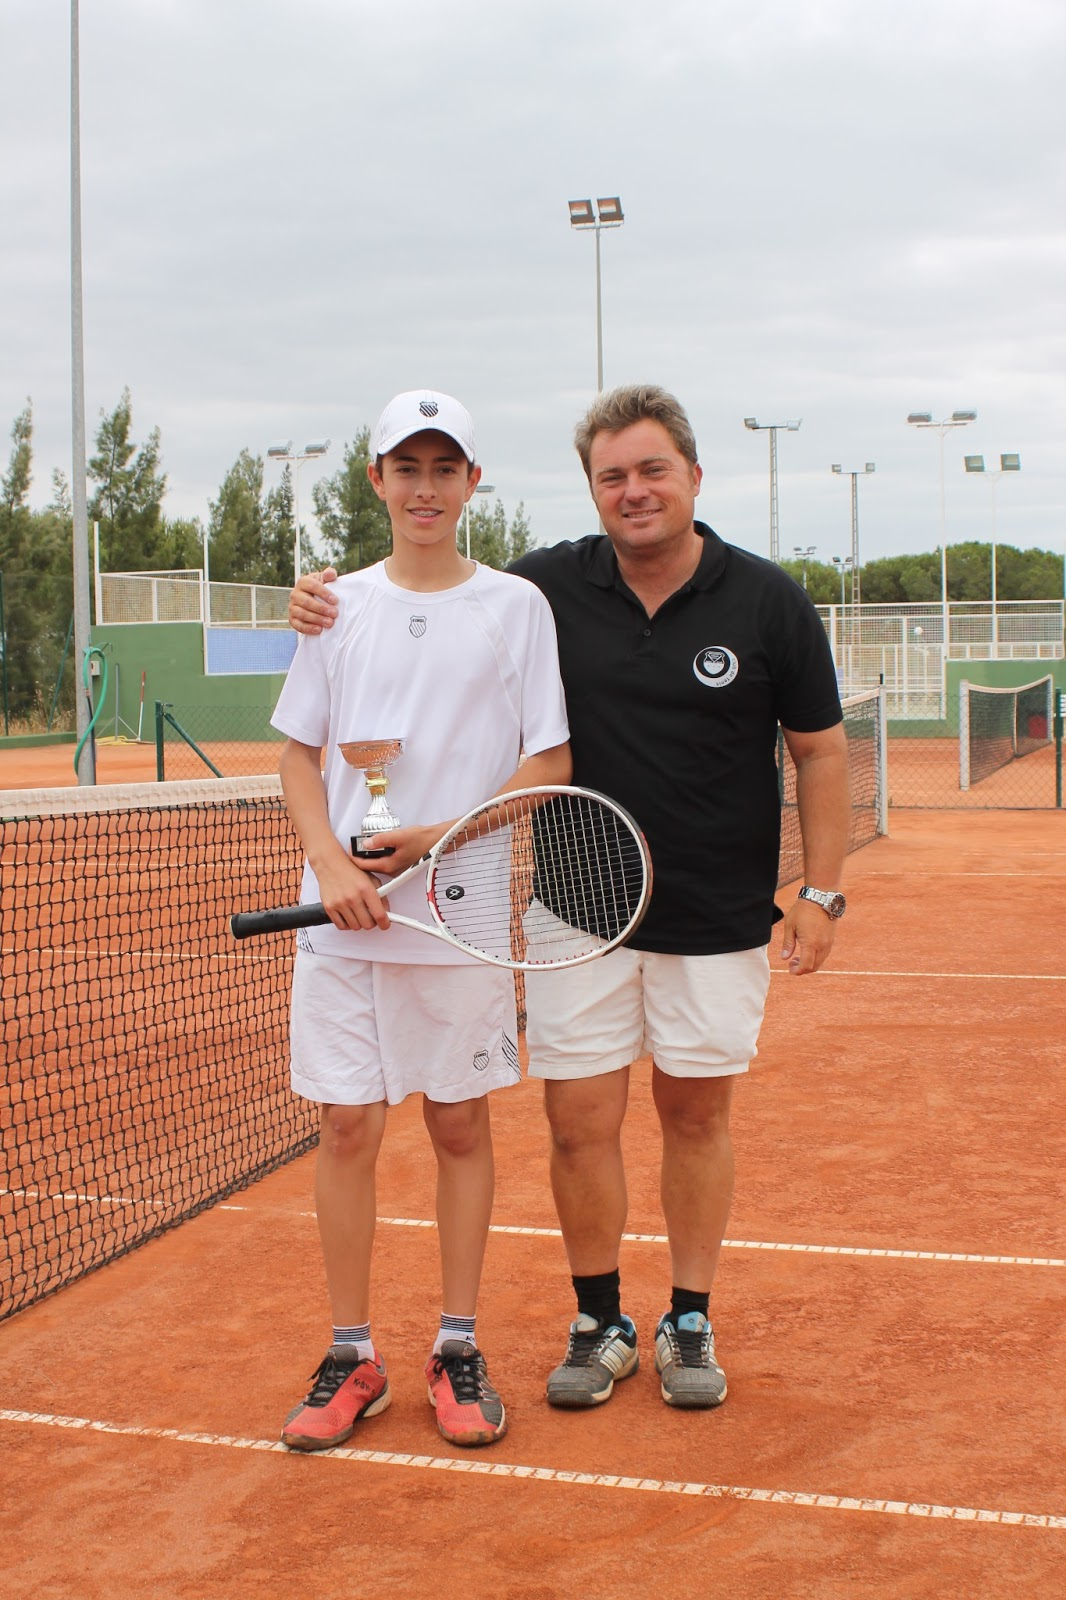 Circuito Tenis : Andatenis circuito de tenis quot el legado ingles huelva